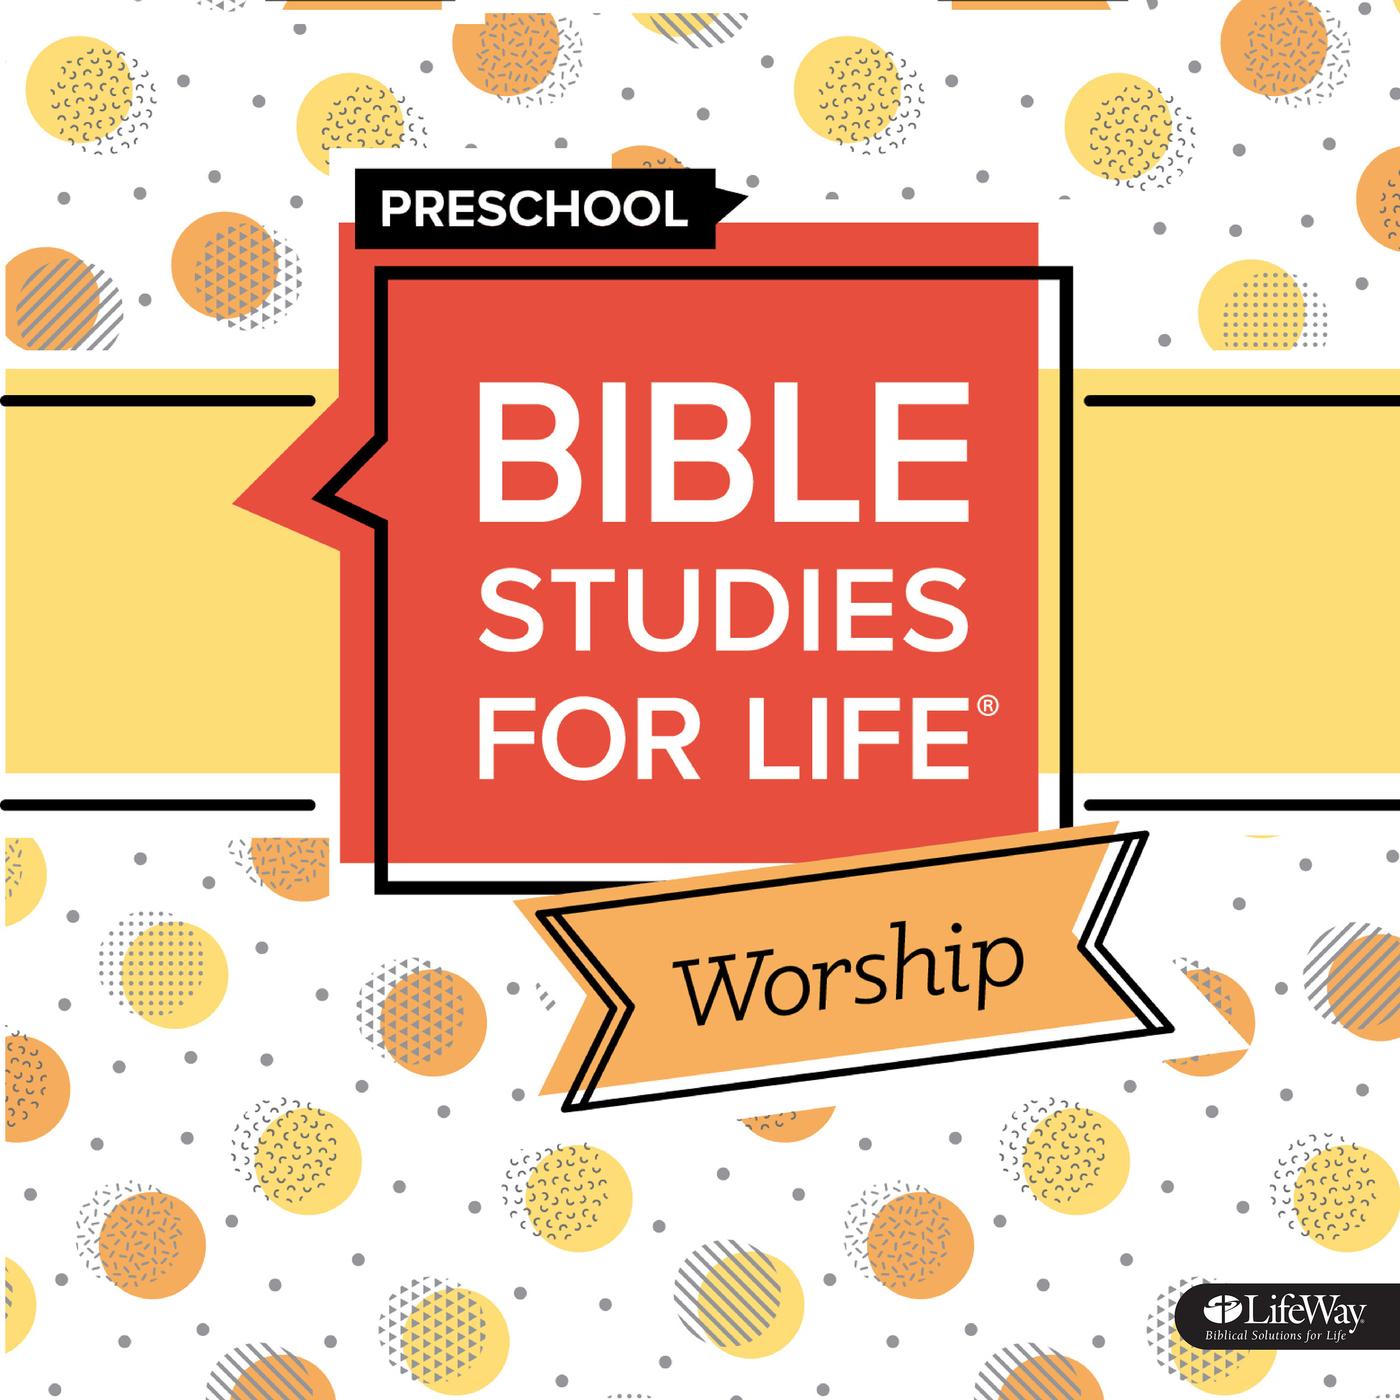 Bible Studies for Life Preschool Worship Winter 2020 - Lifeway Kids